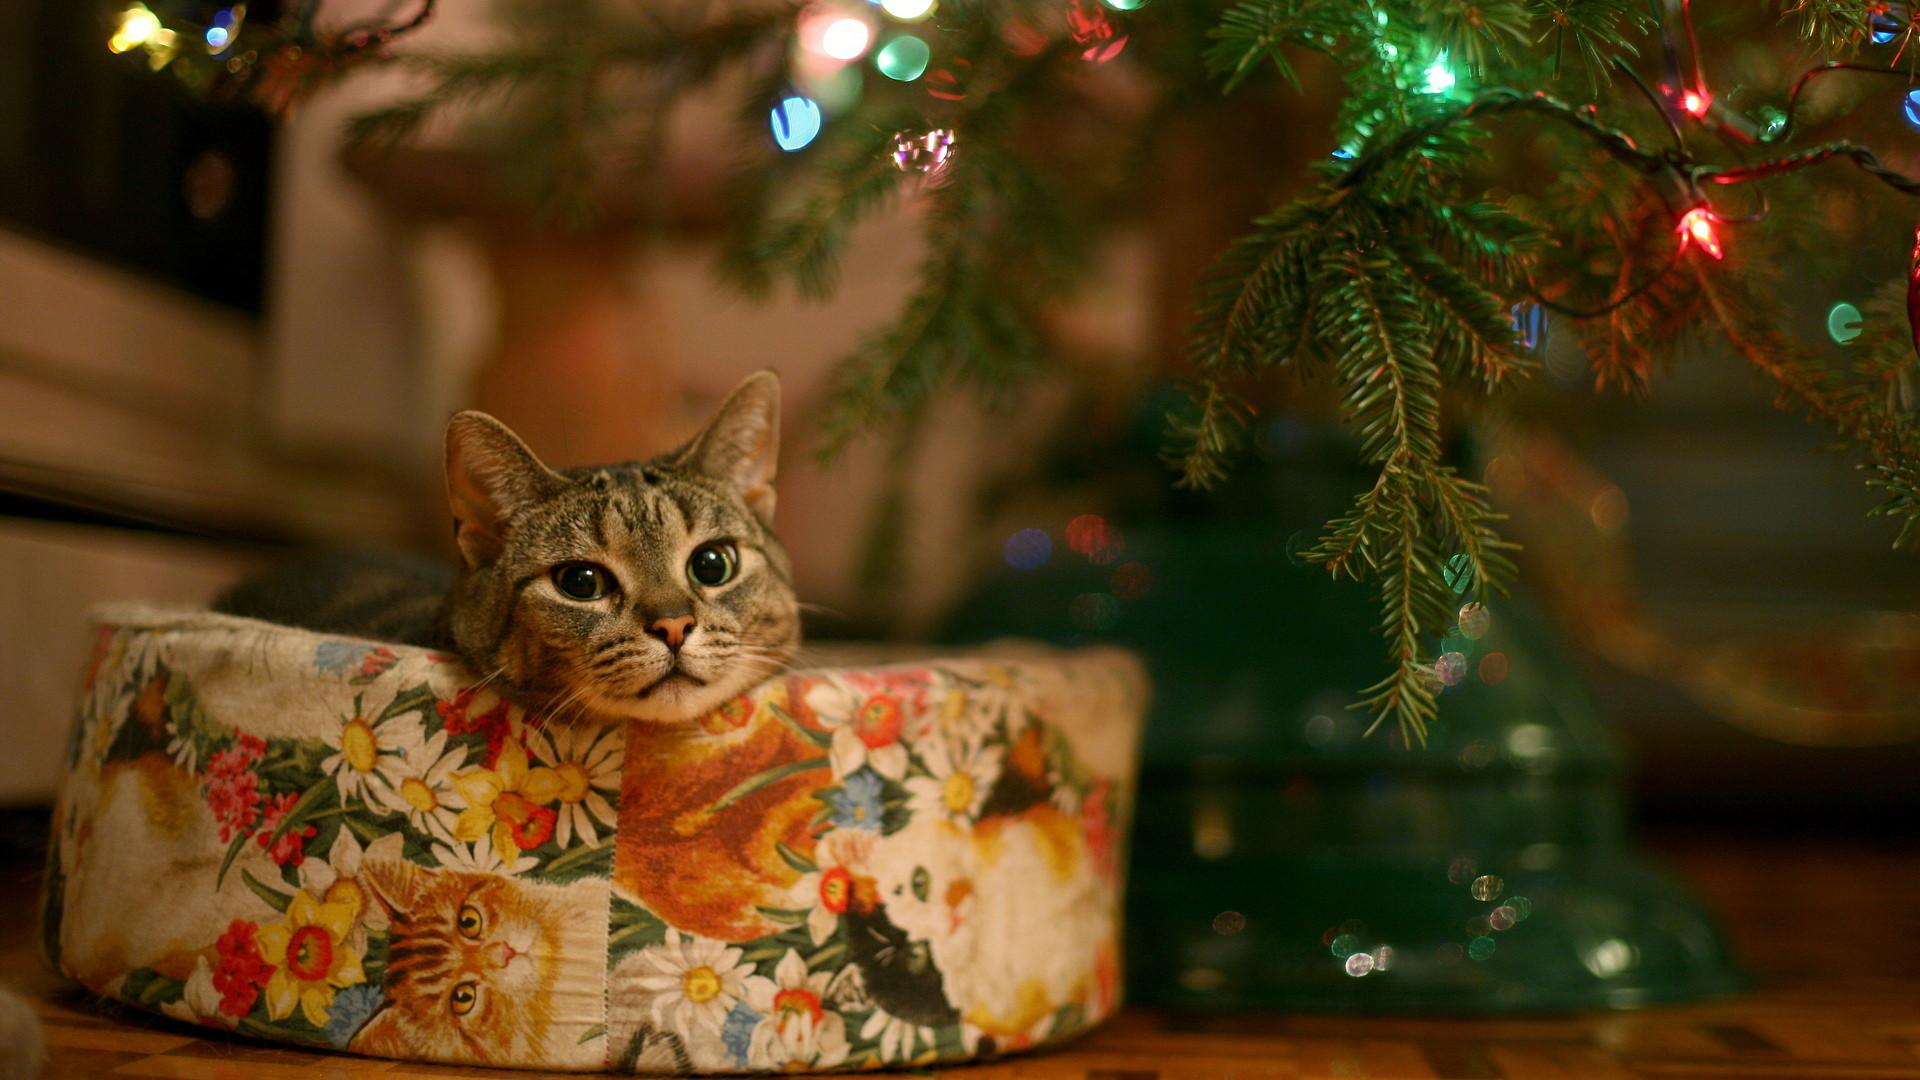 Outdoor Christmas Nativity Scene HD desktop wallpaper : Widescreen .